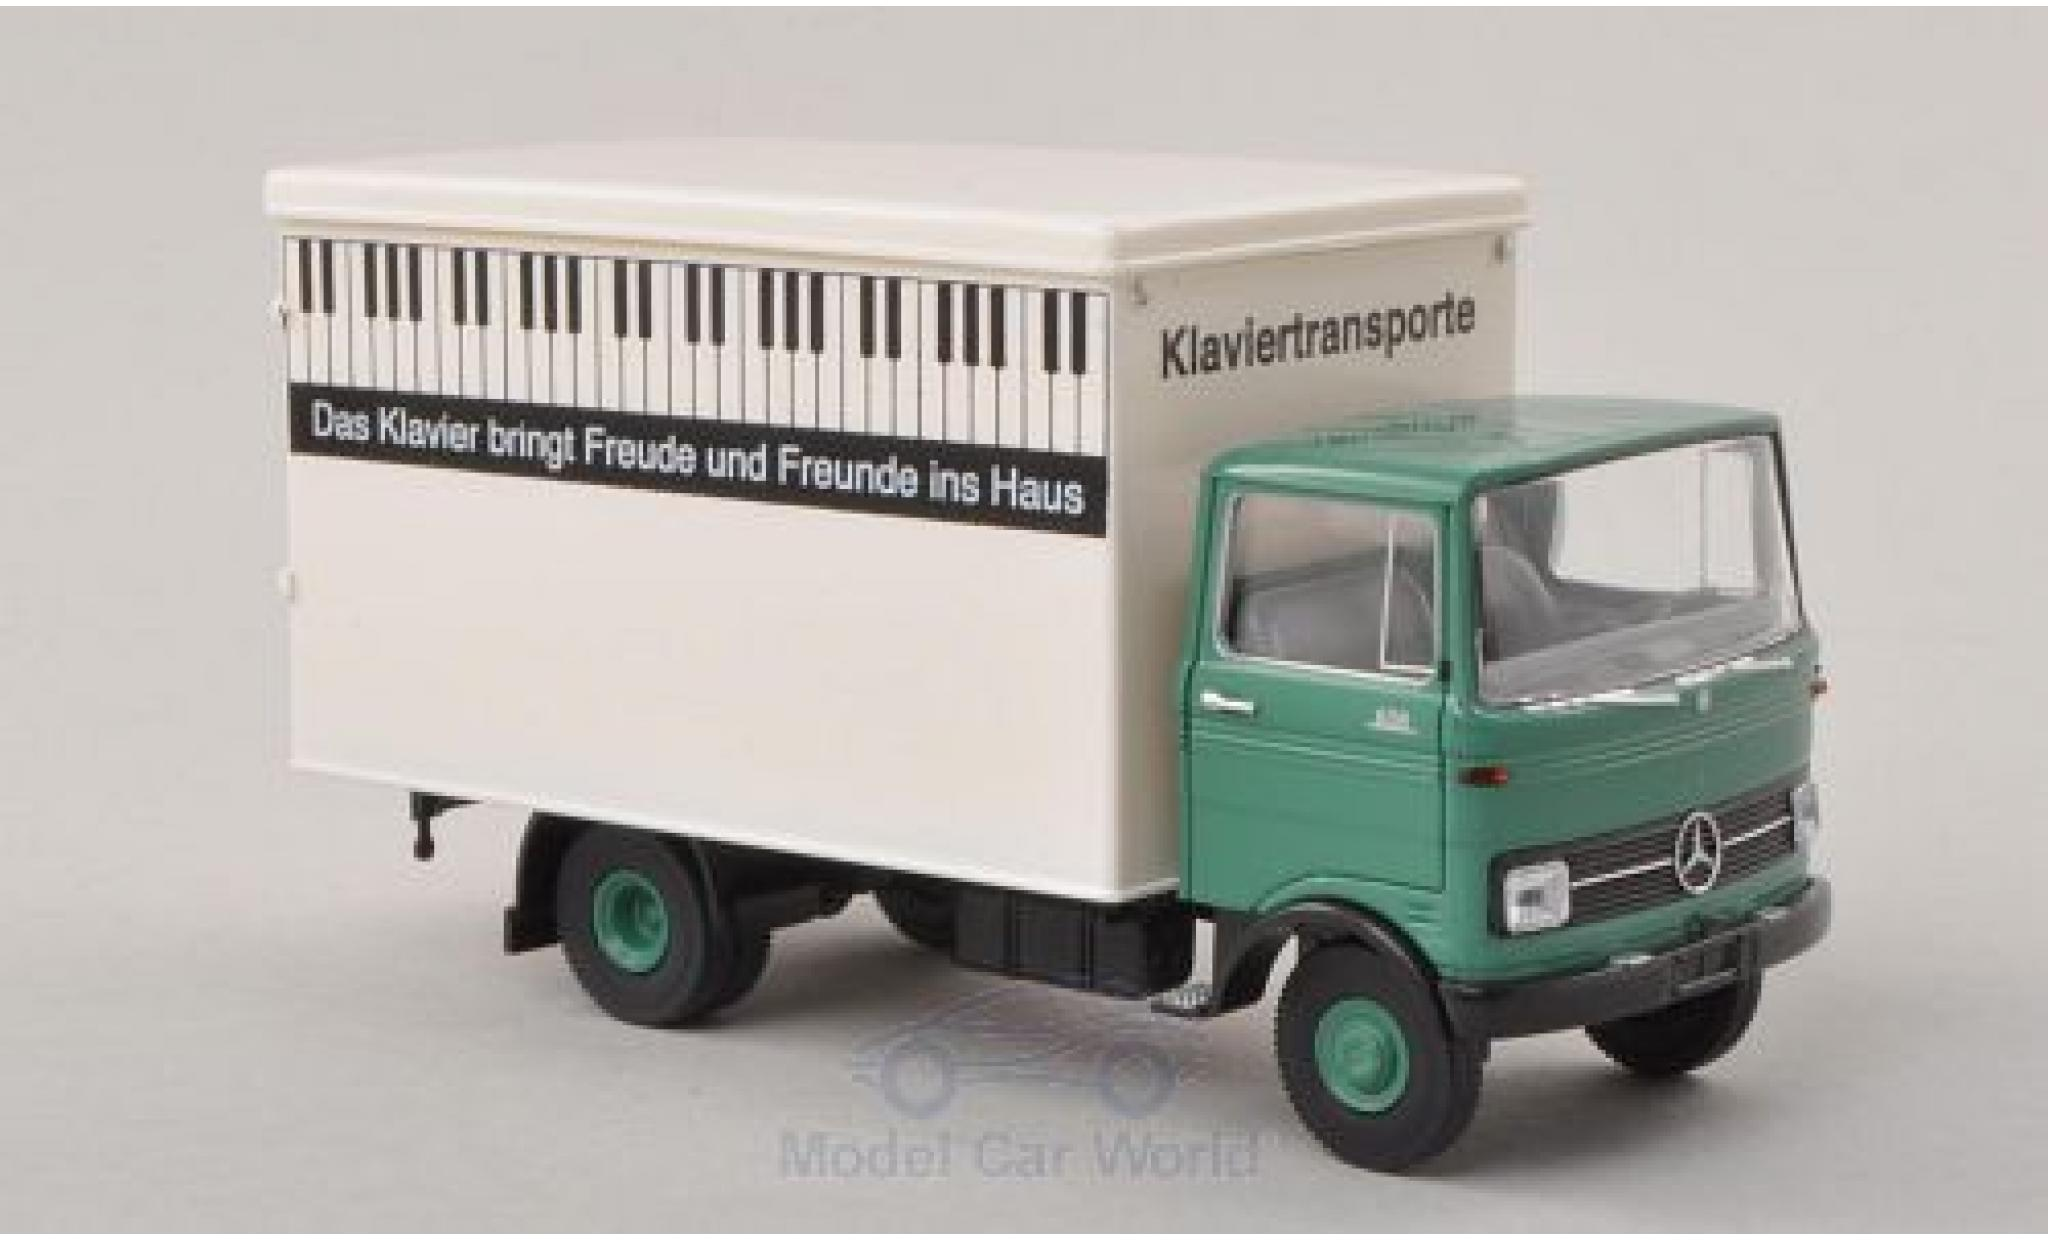 Mercedes LP 608 1/87 Brekina Klaviertransporte